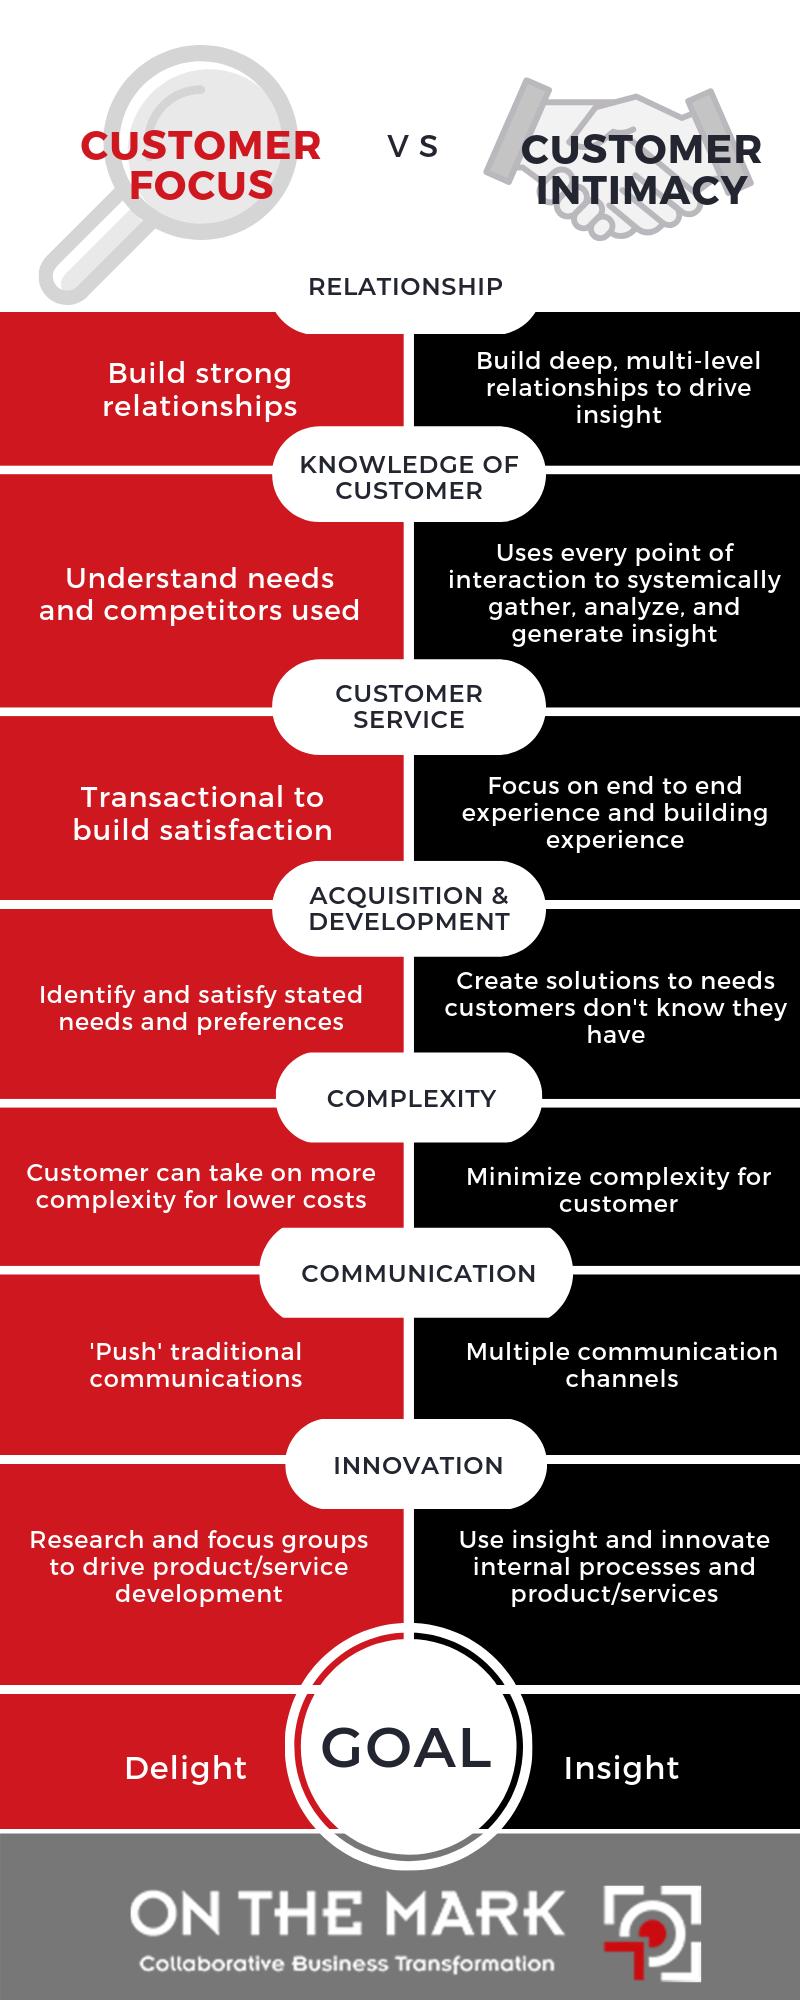 customer focus vs customer intimacy